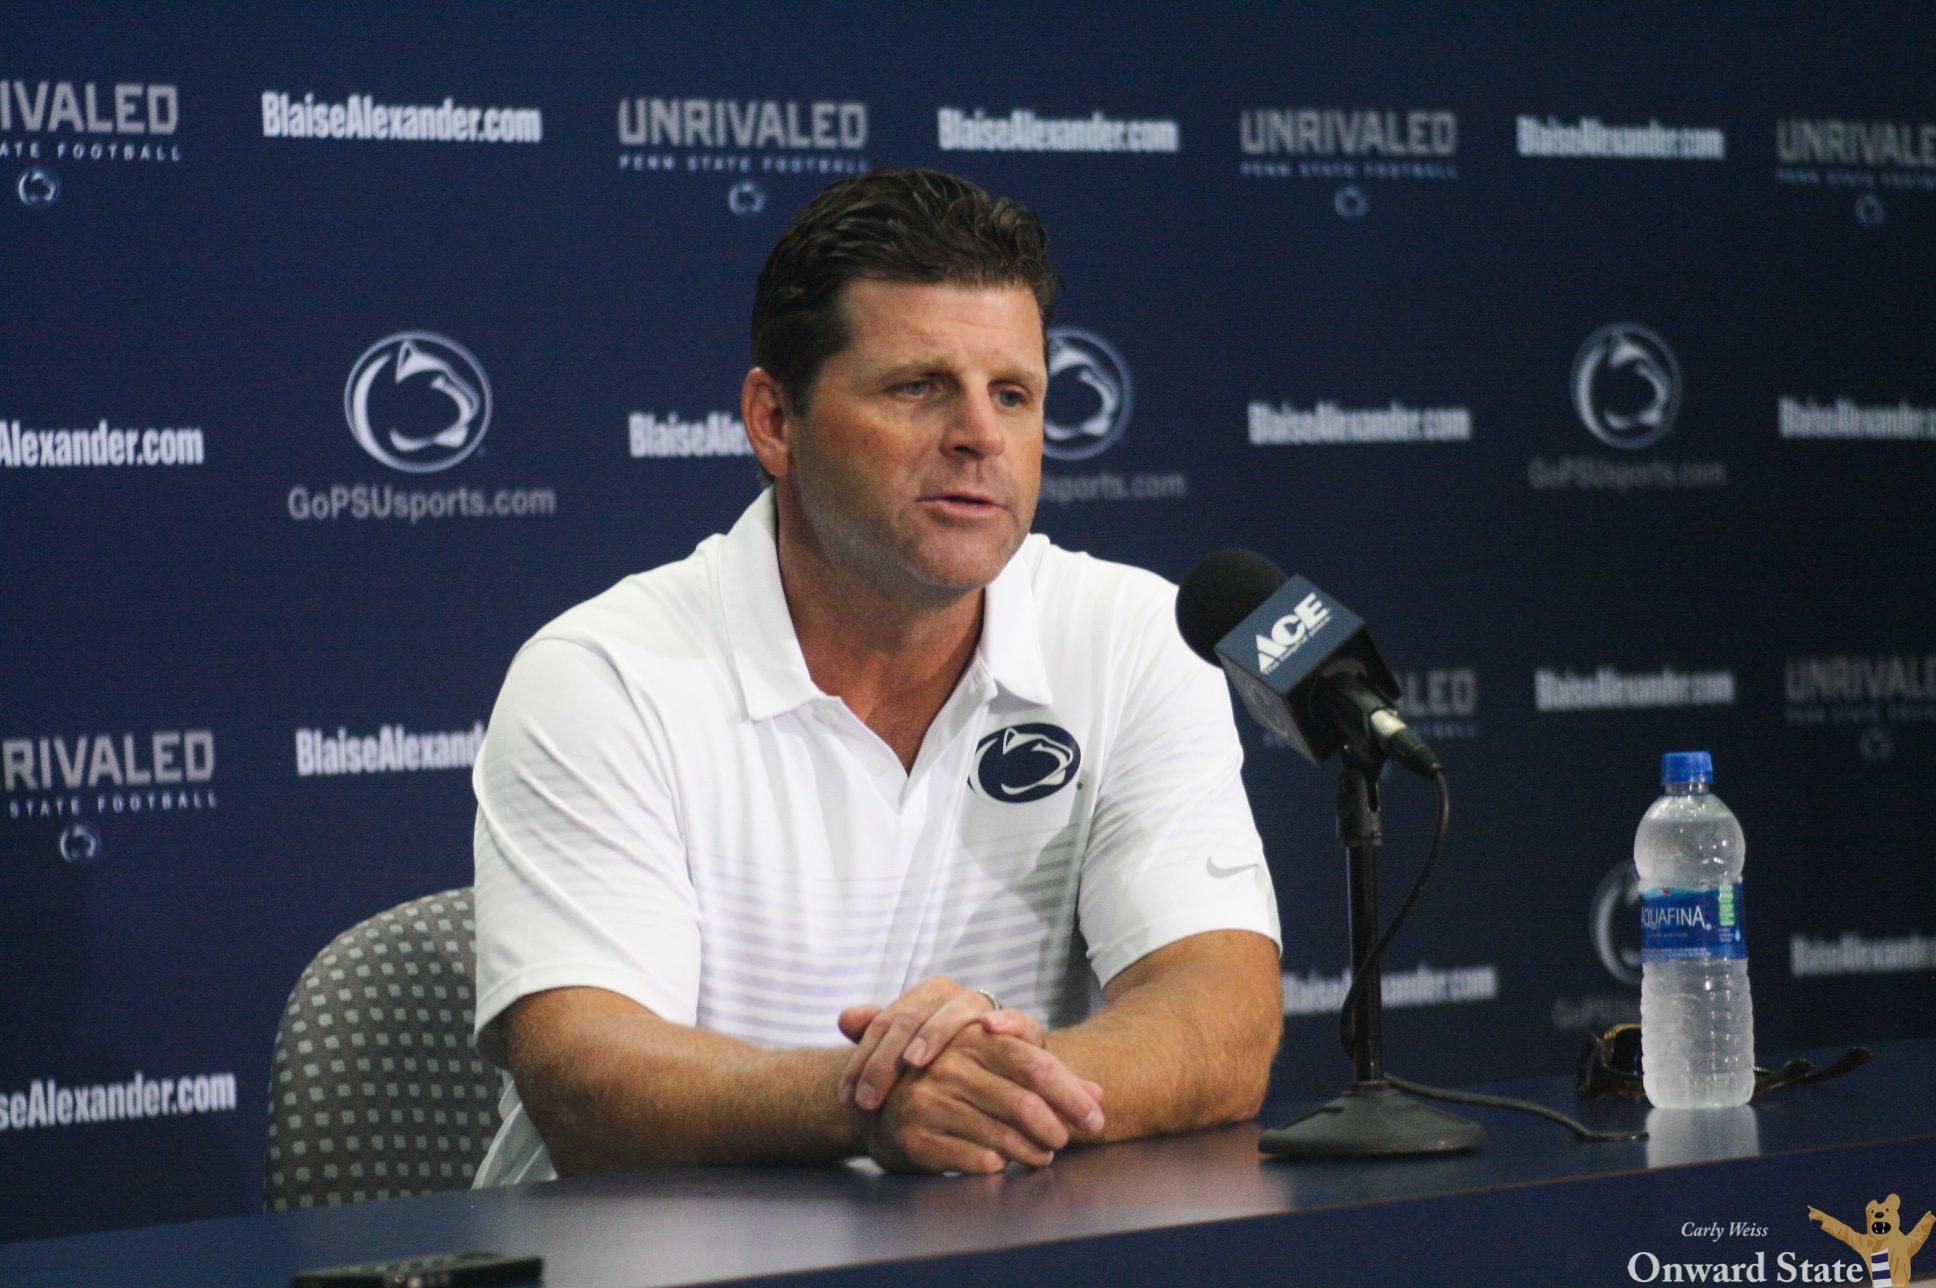 Former Penn State team doctor sues Franklin, Barbour, school